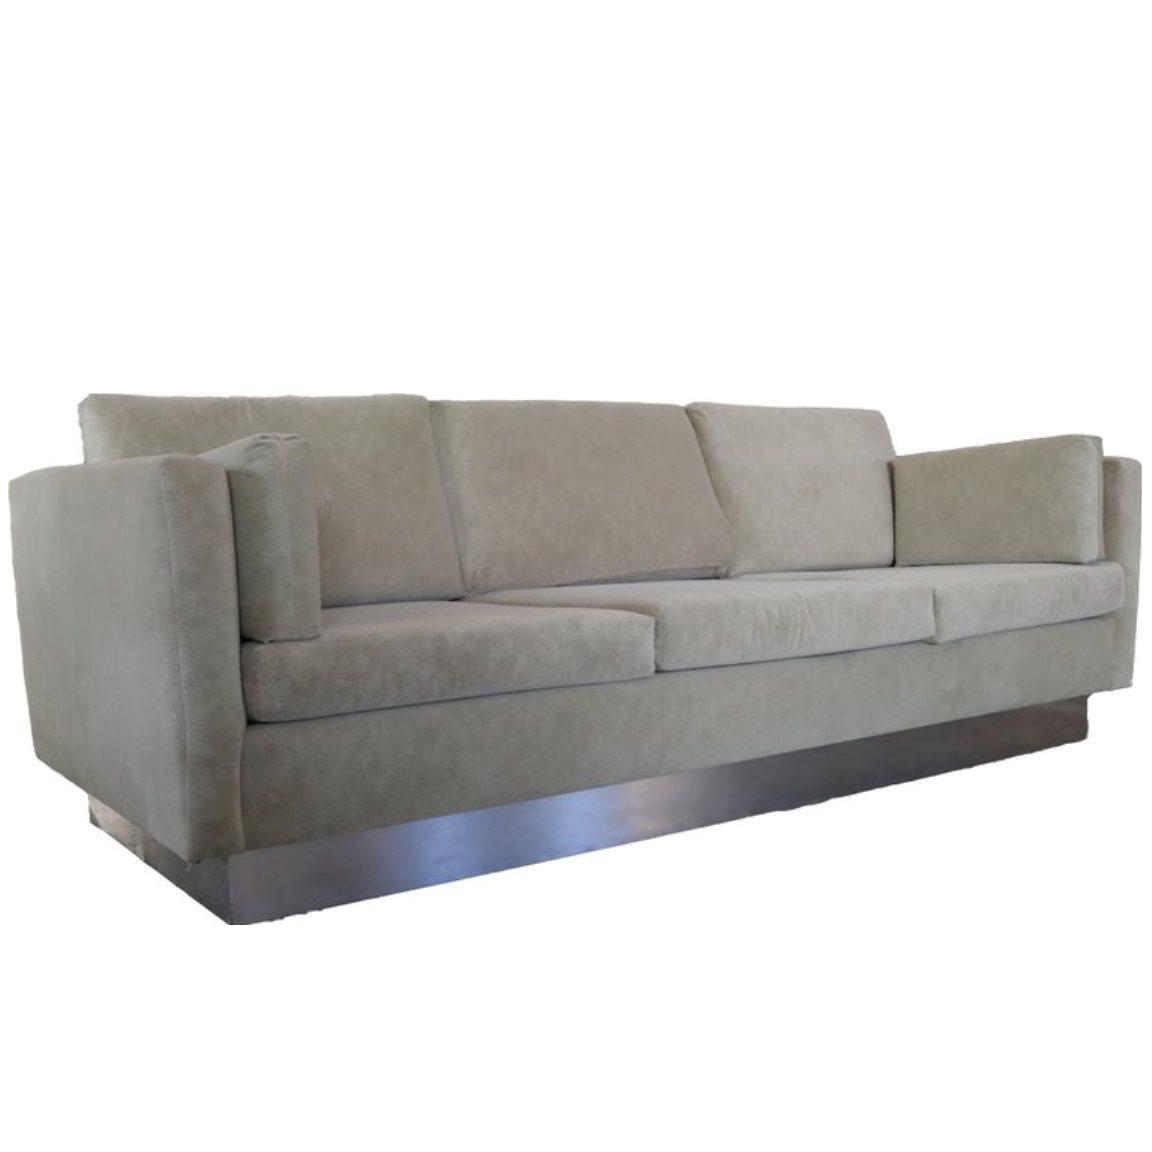 Superieur Tuxedo Sofa In Milo Baughman Style